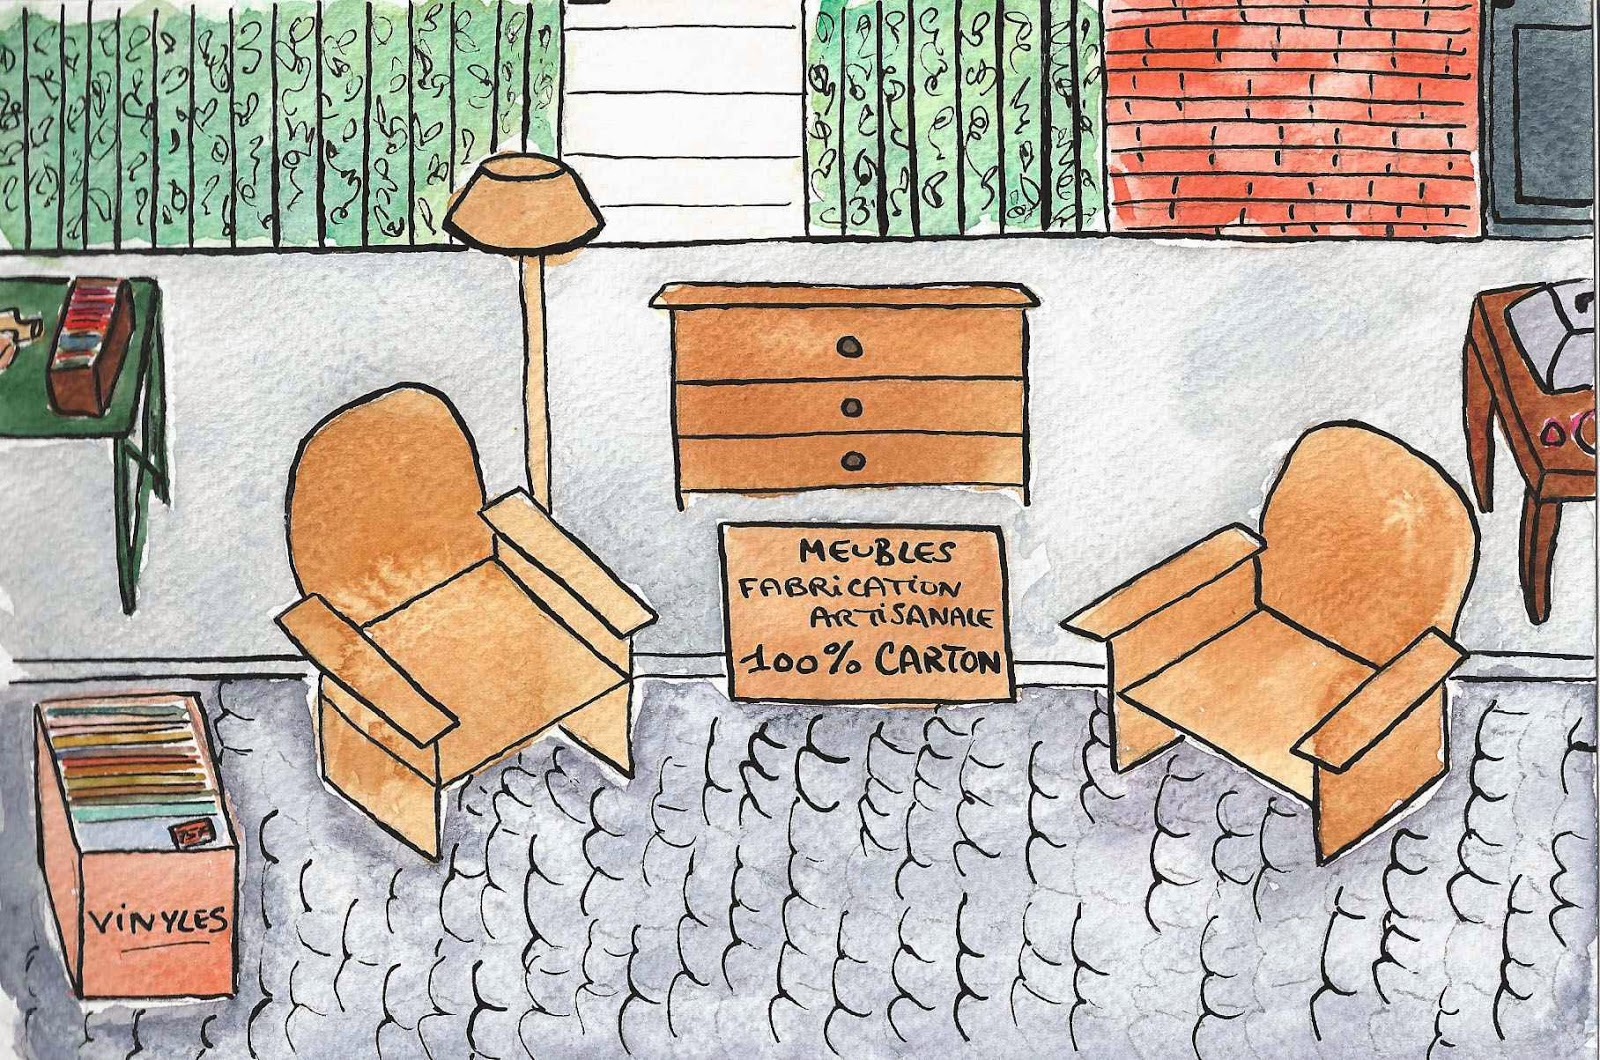 Tout en carton, mobilier fabrication artisanale